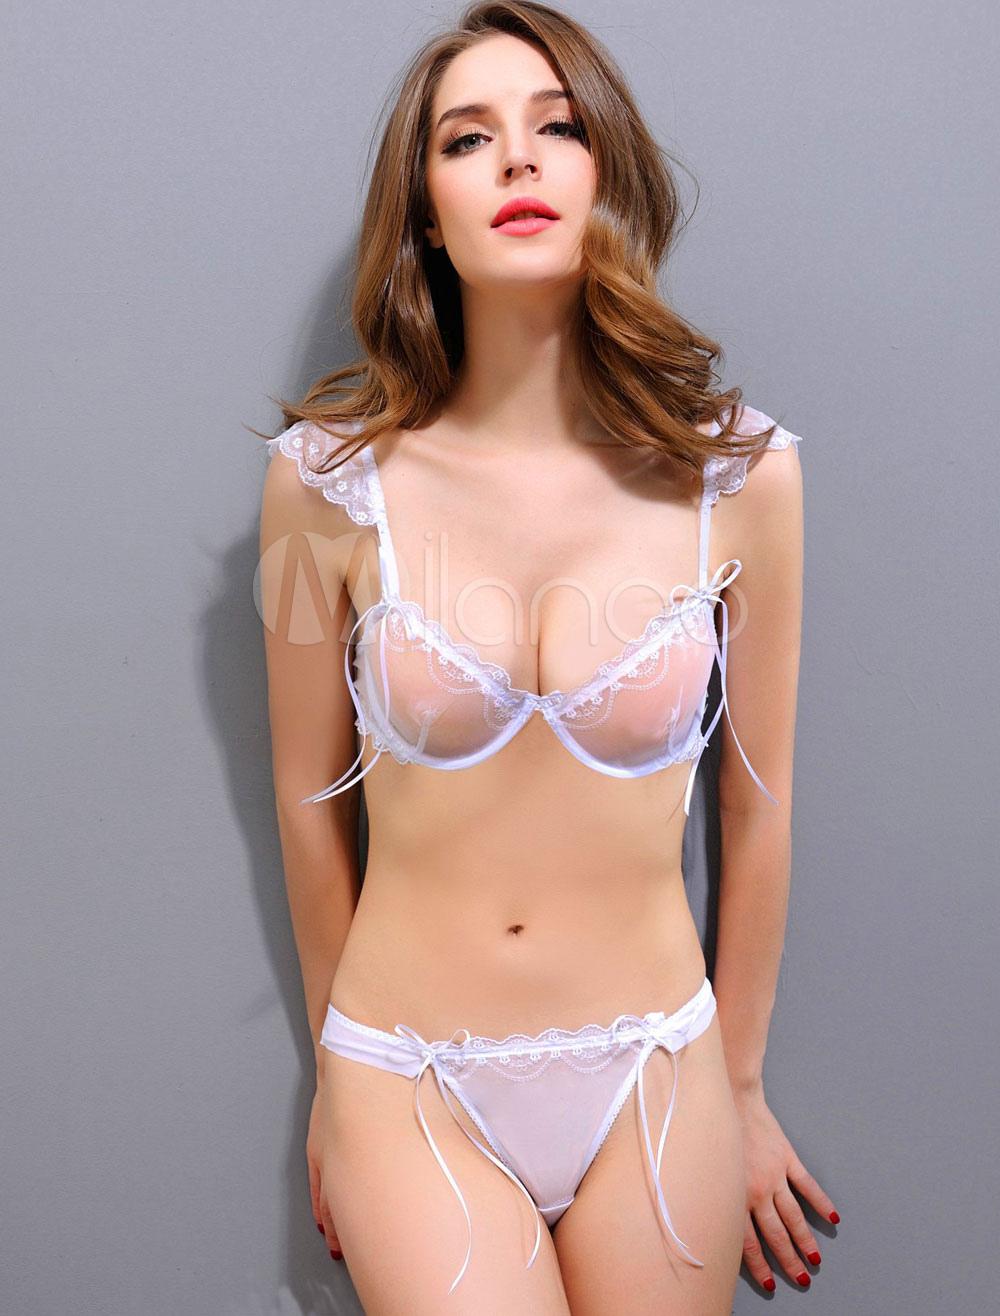 Miss junior nude pageants